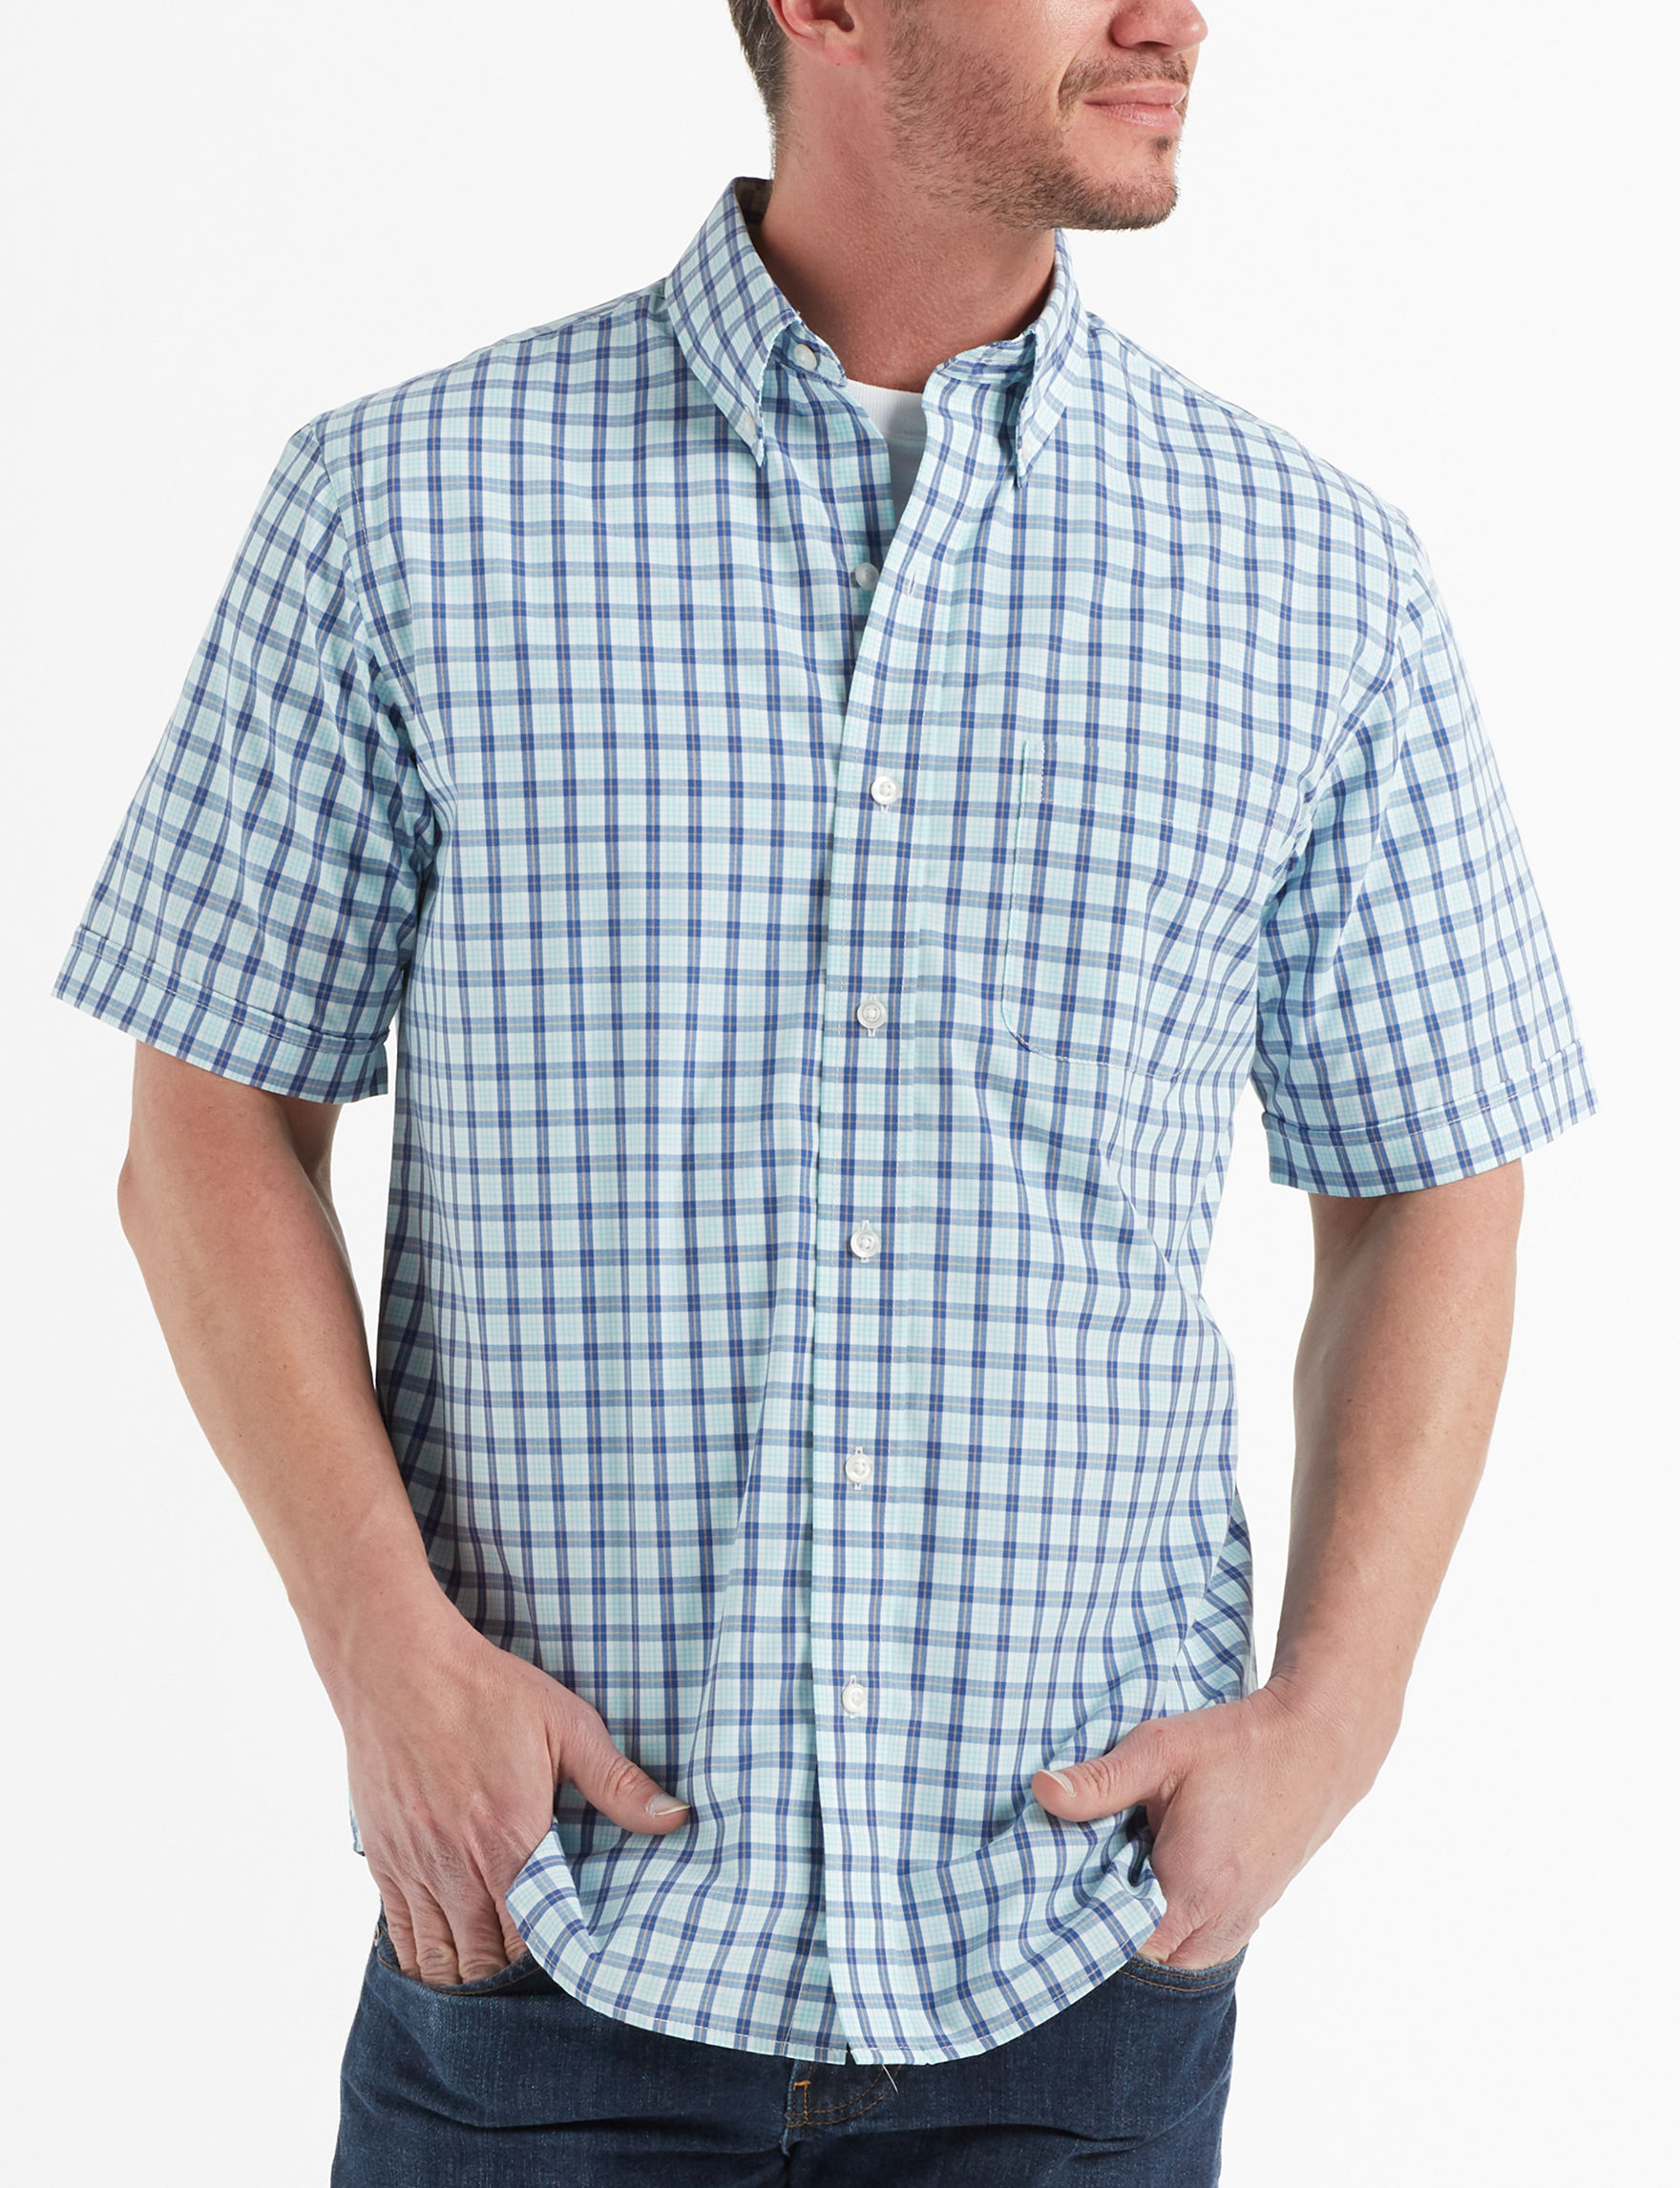 Arrow Aqua Splash Casual Button Down Shirts